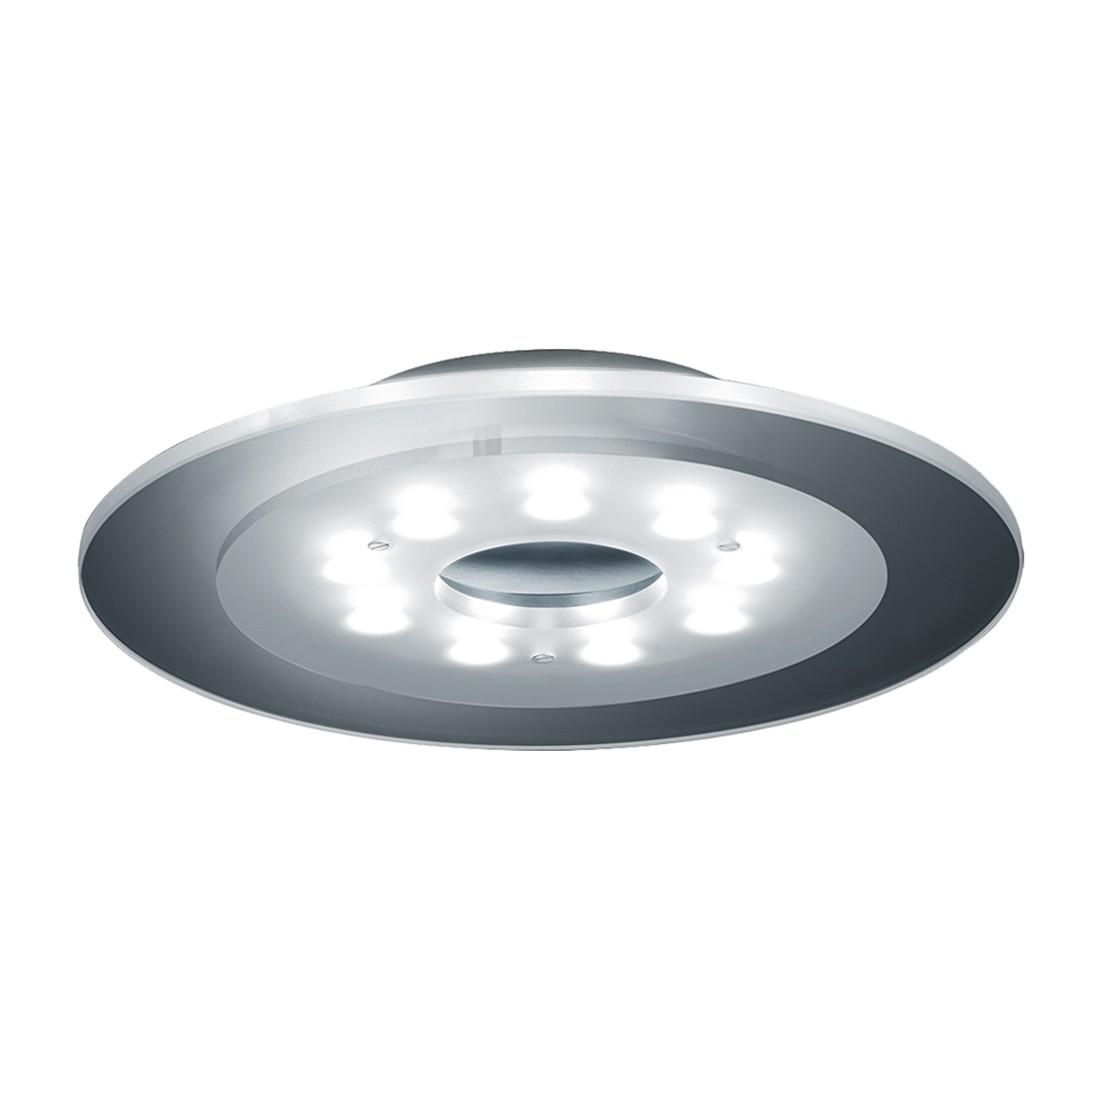 energie  A+, Plafondlamp Alide - metaal zilverkleurig, Helestra